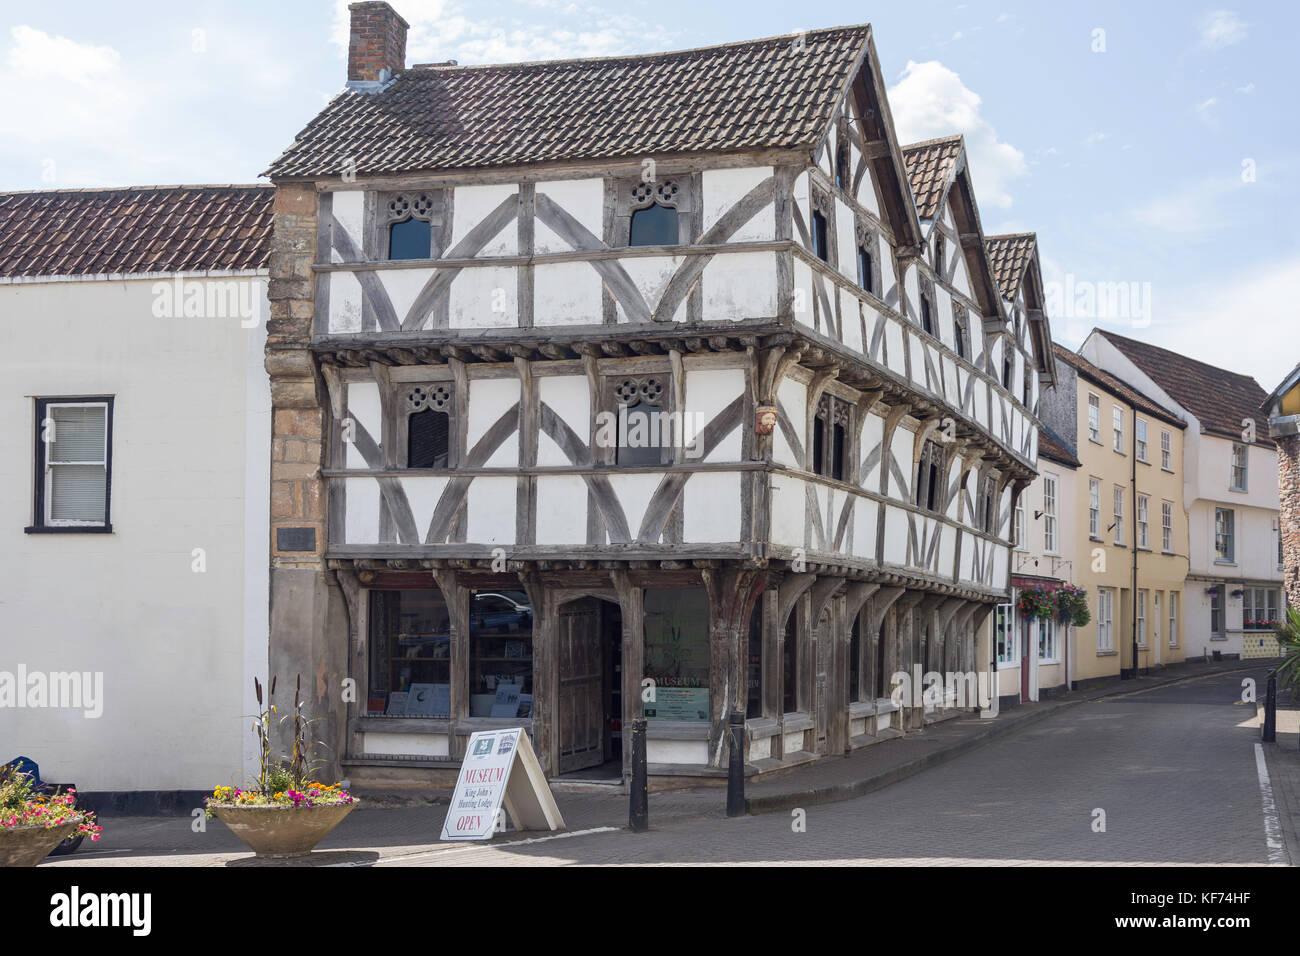 15th century St John's Hunting Lodge, The Square, Axbridge, Somerset, England, United Kingdom - Stock Image